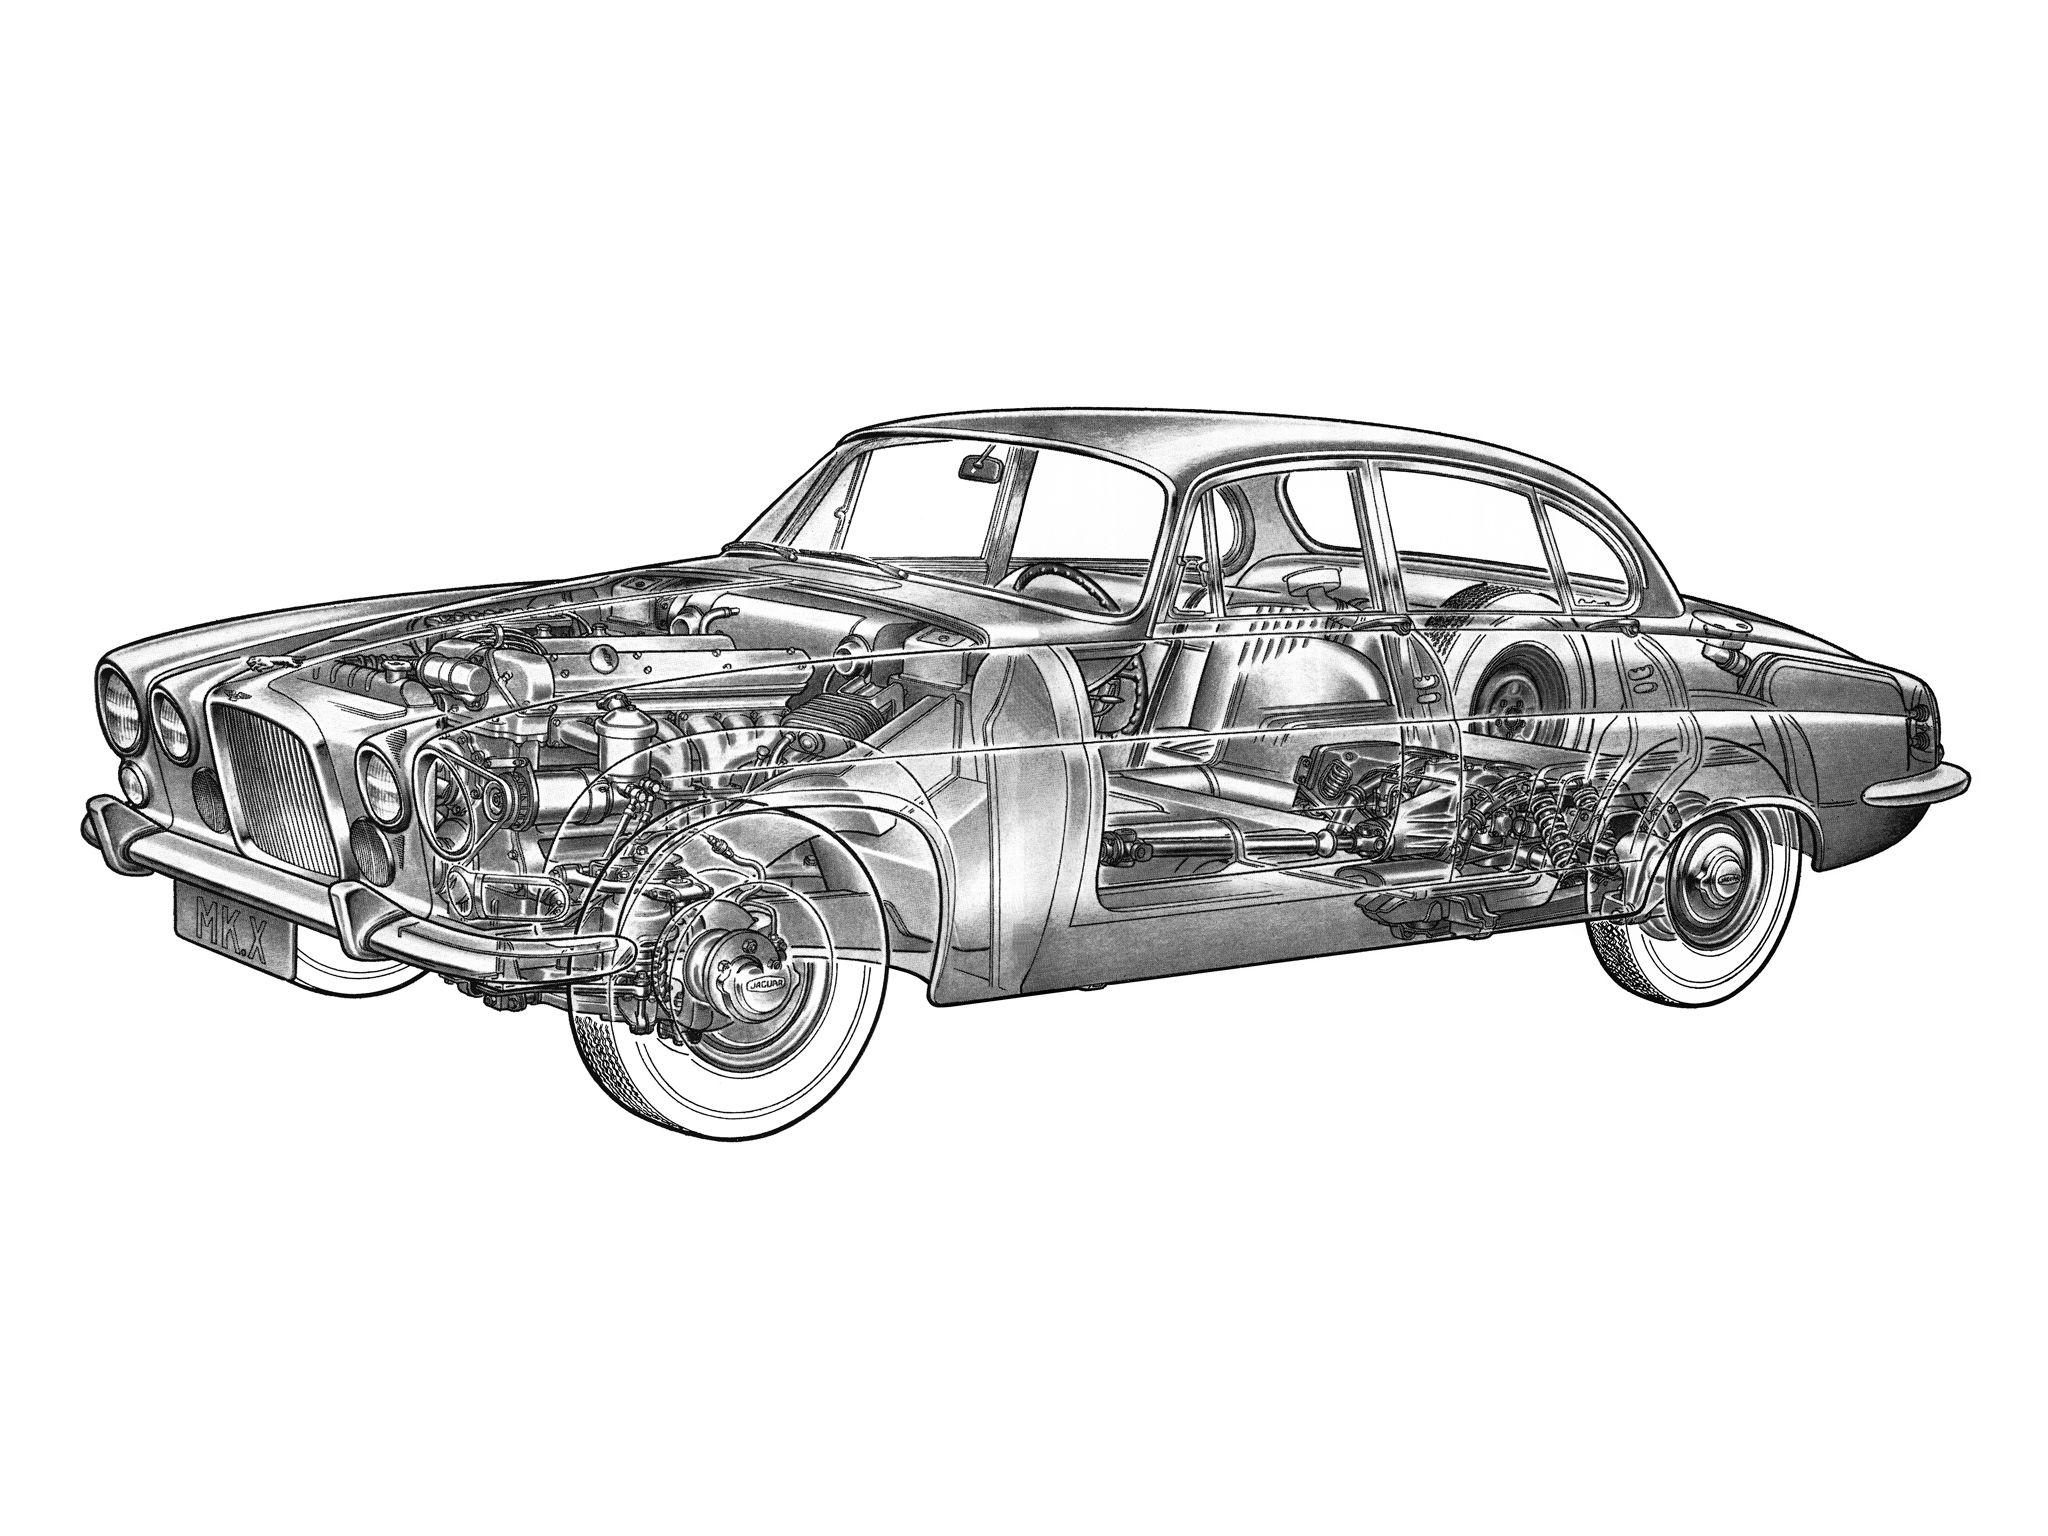 Line Drawing Jaguar : Jaguar mark illustrator uncredited cutaway line